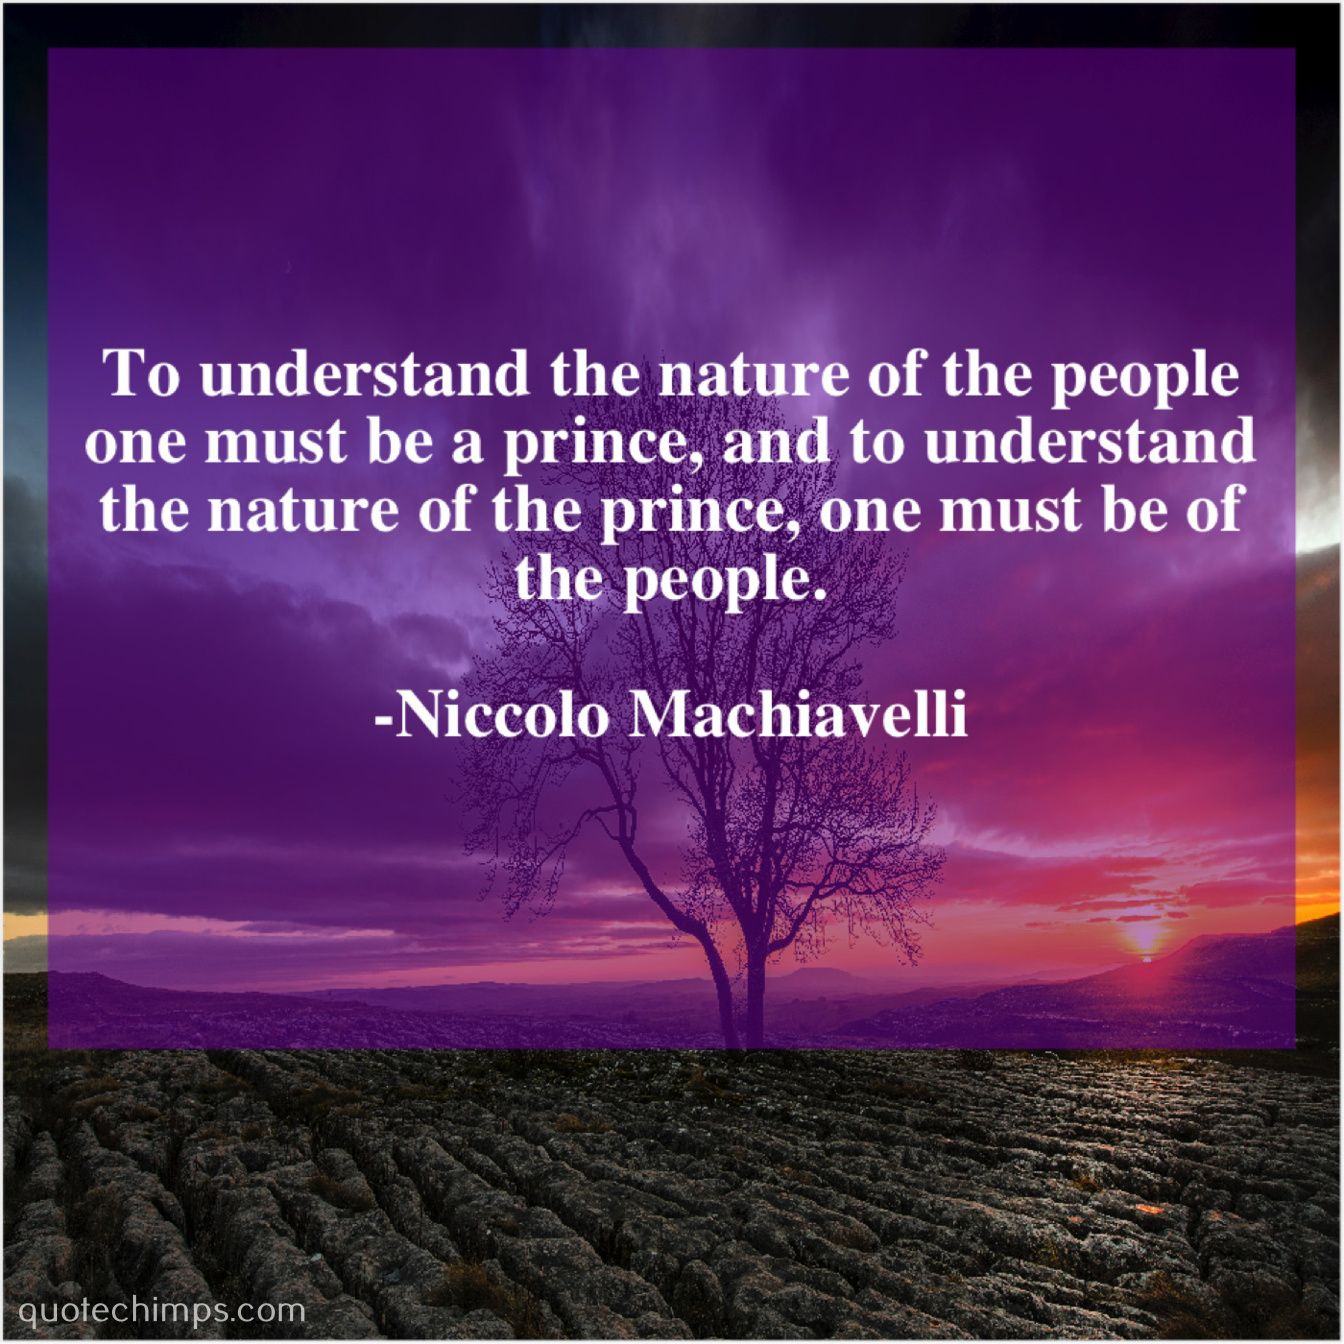 Niccolo Machiavelli: Niccolo Machiavelli To understand the nature of